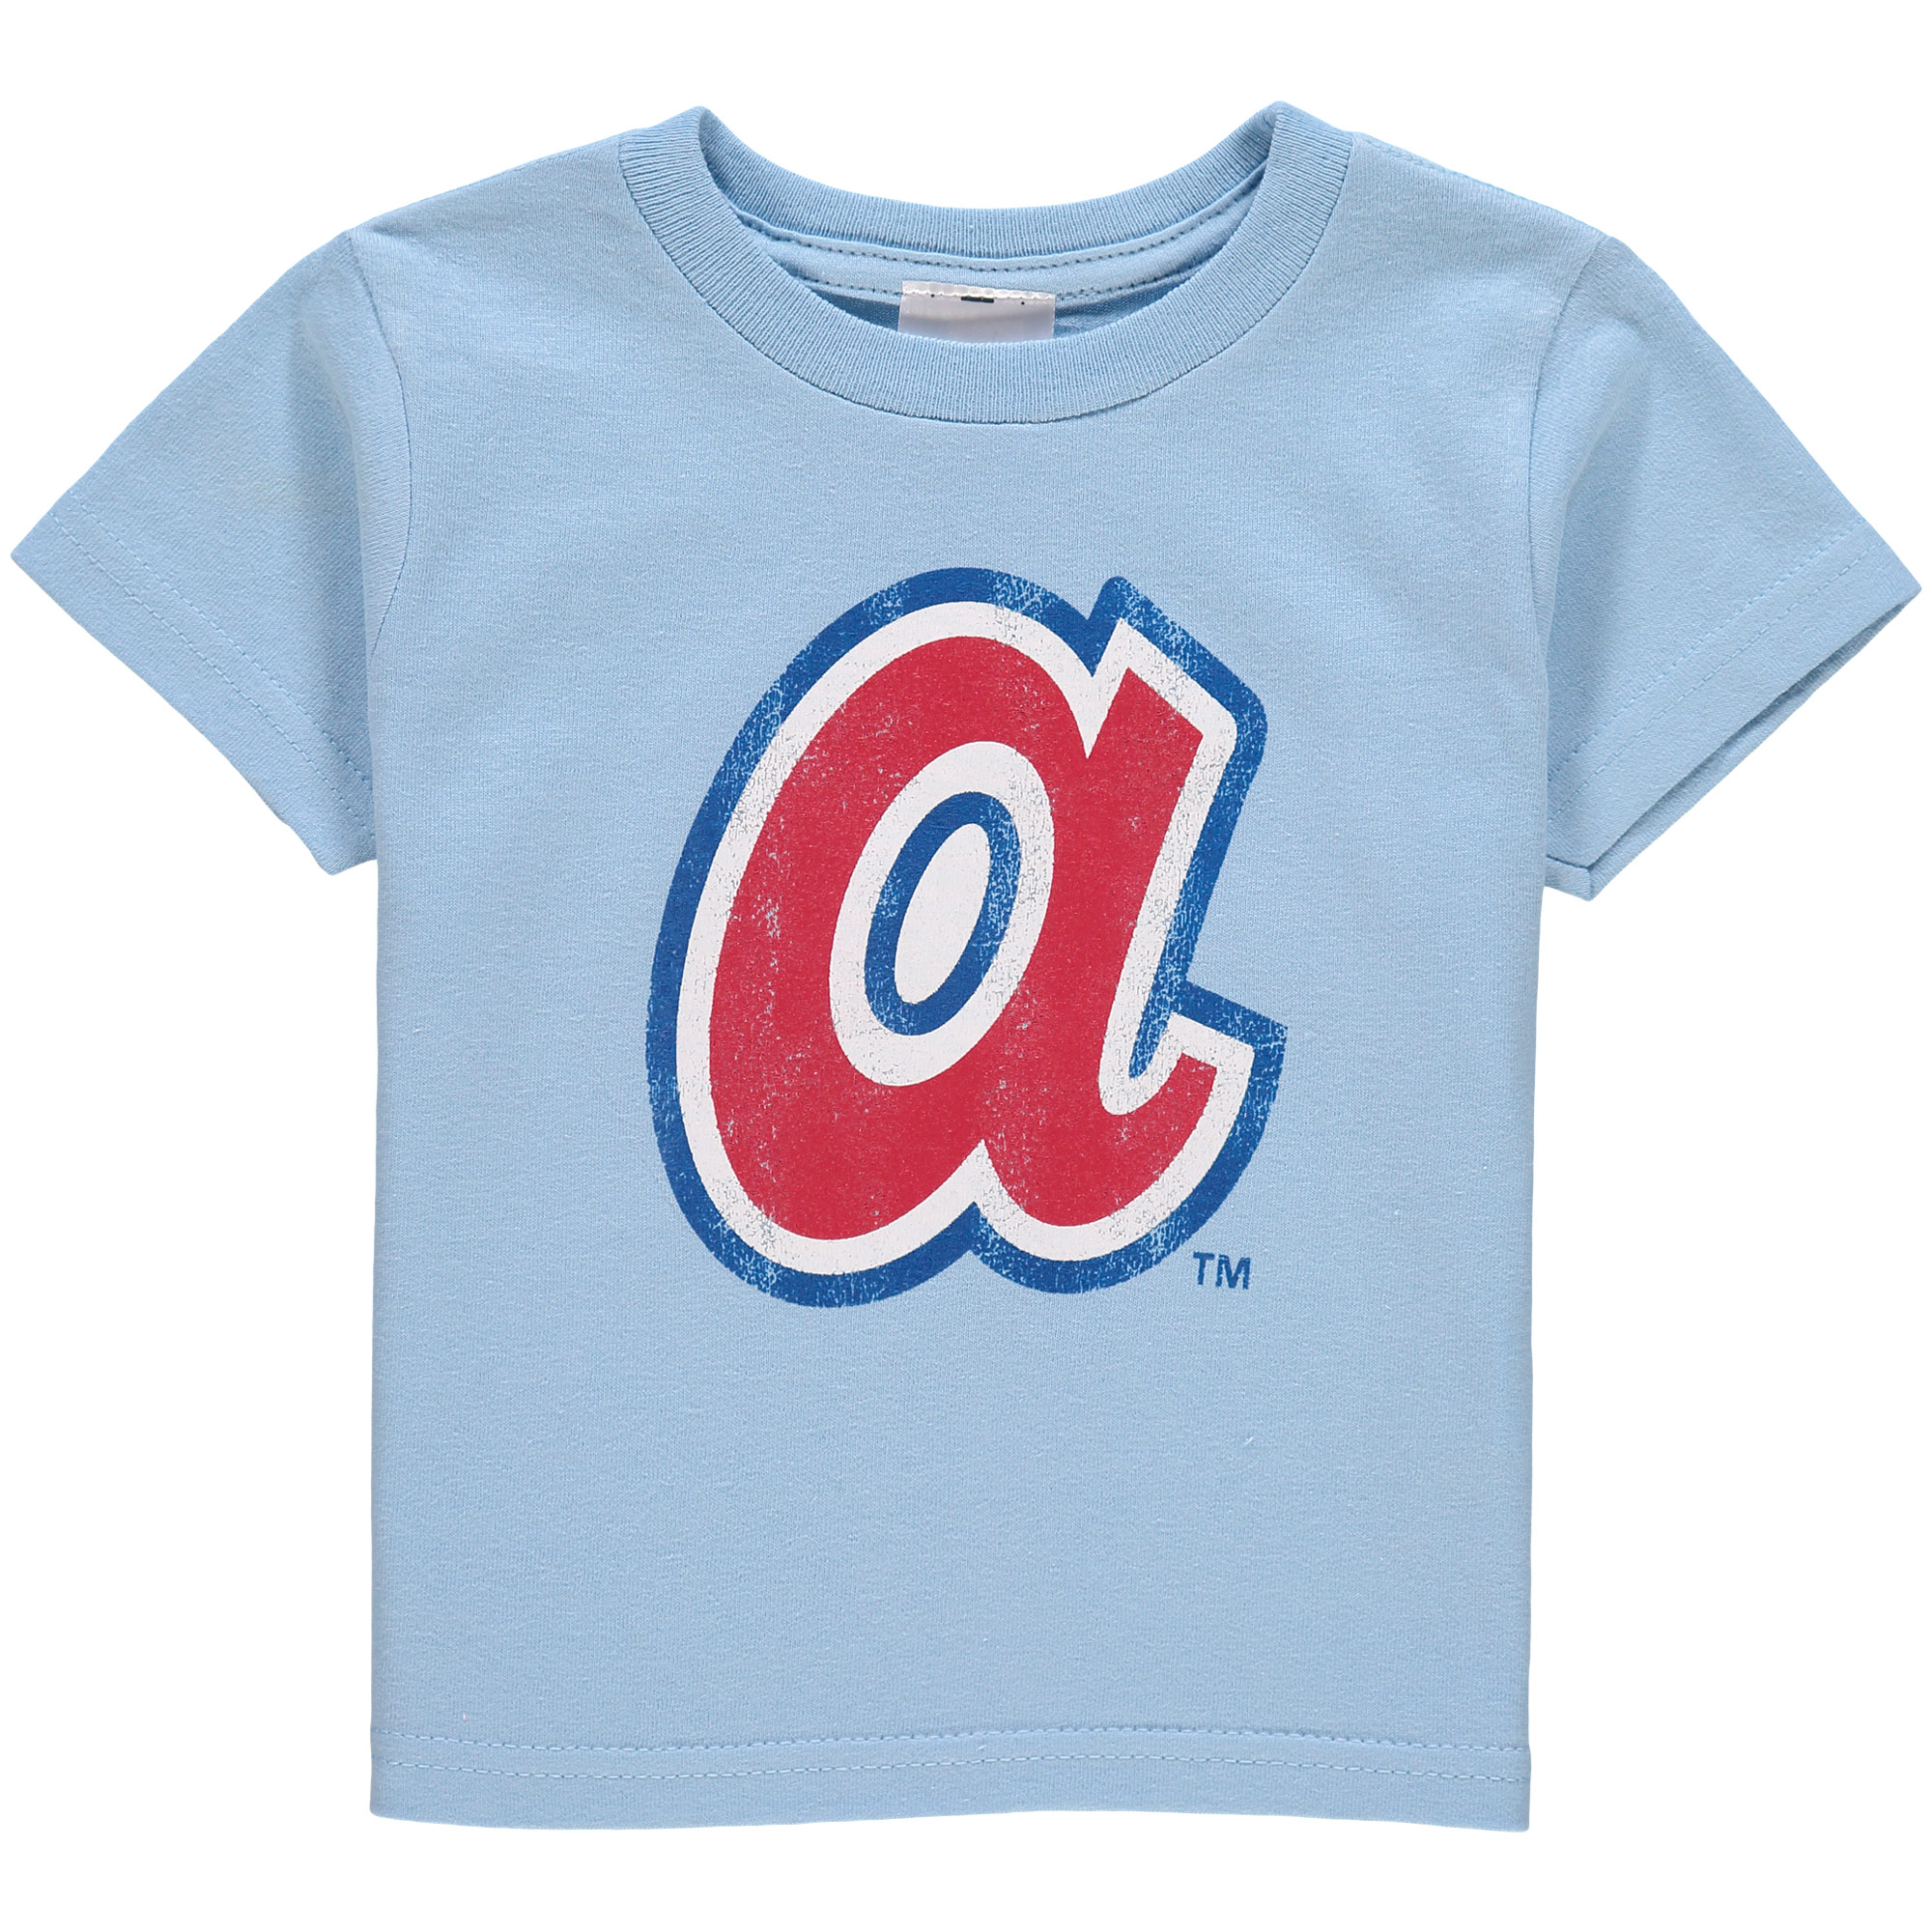 Atlanta Braves Soft As A Grape Toddler Cooperstown Collection Shutout T-Shirt - Light Blue